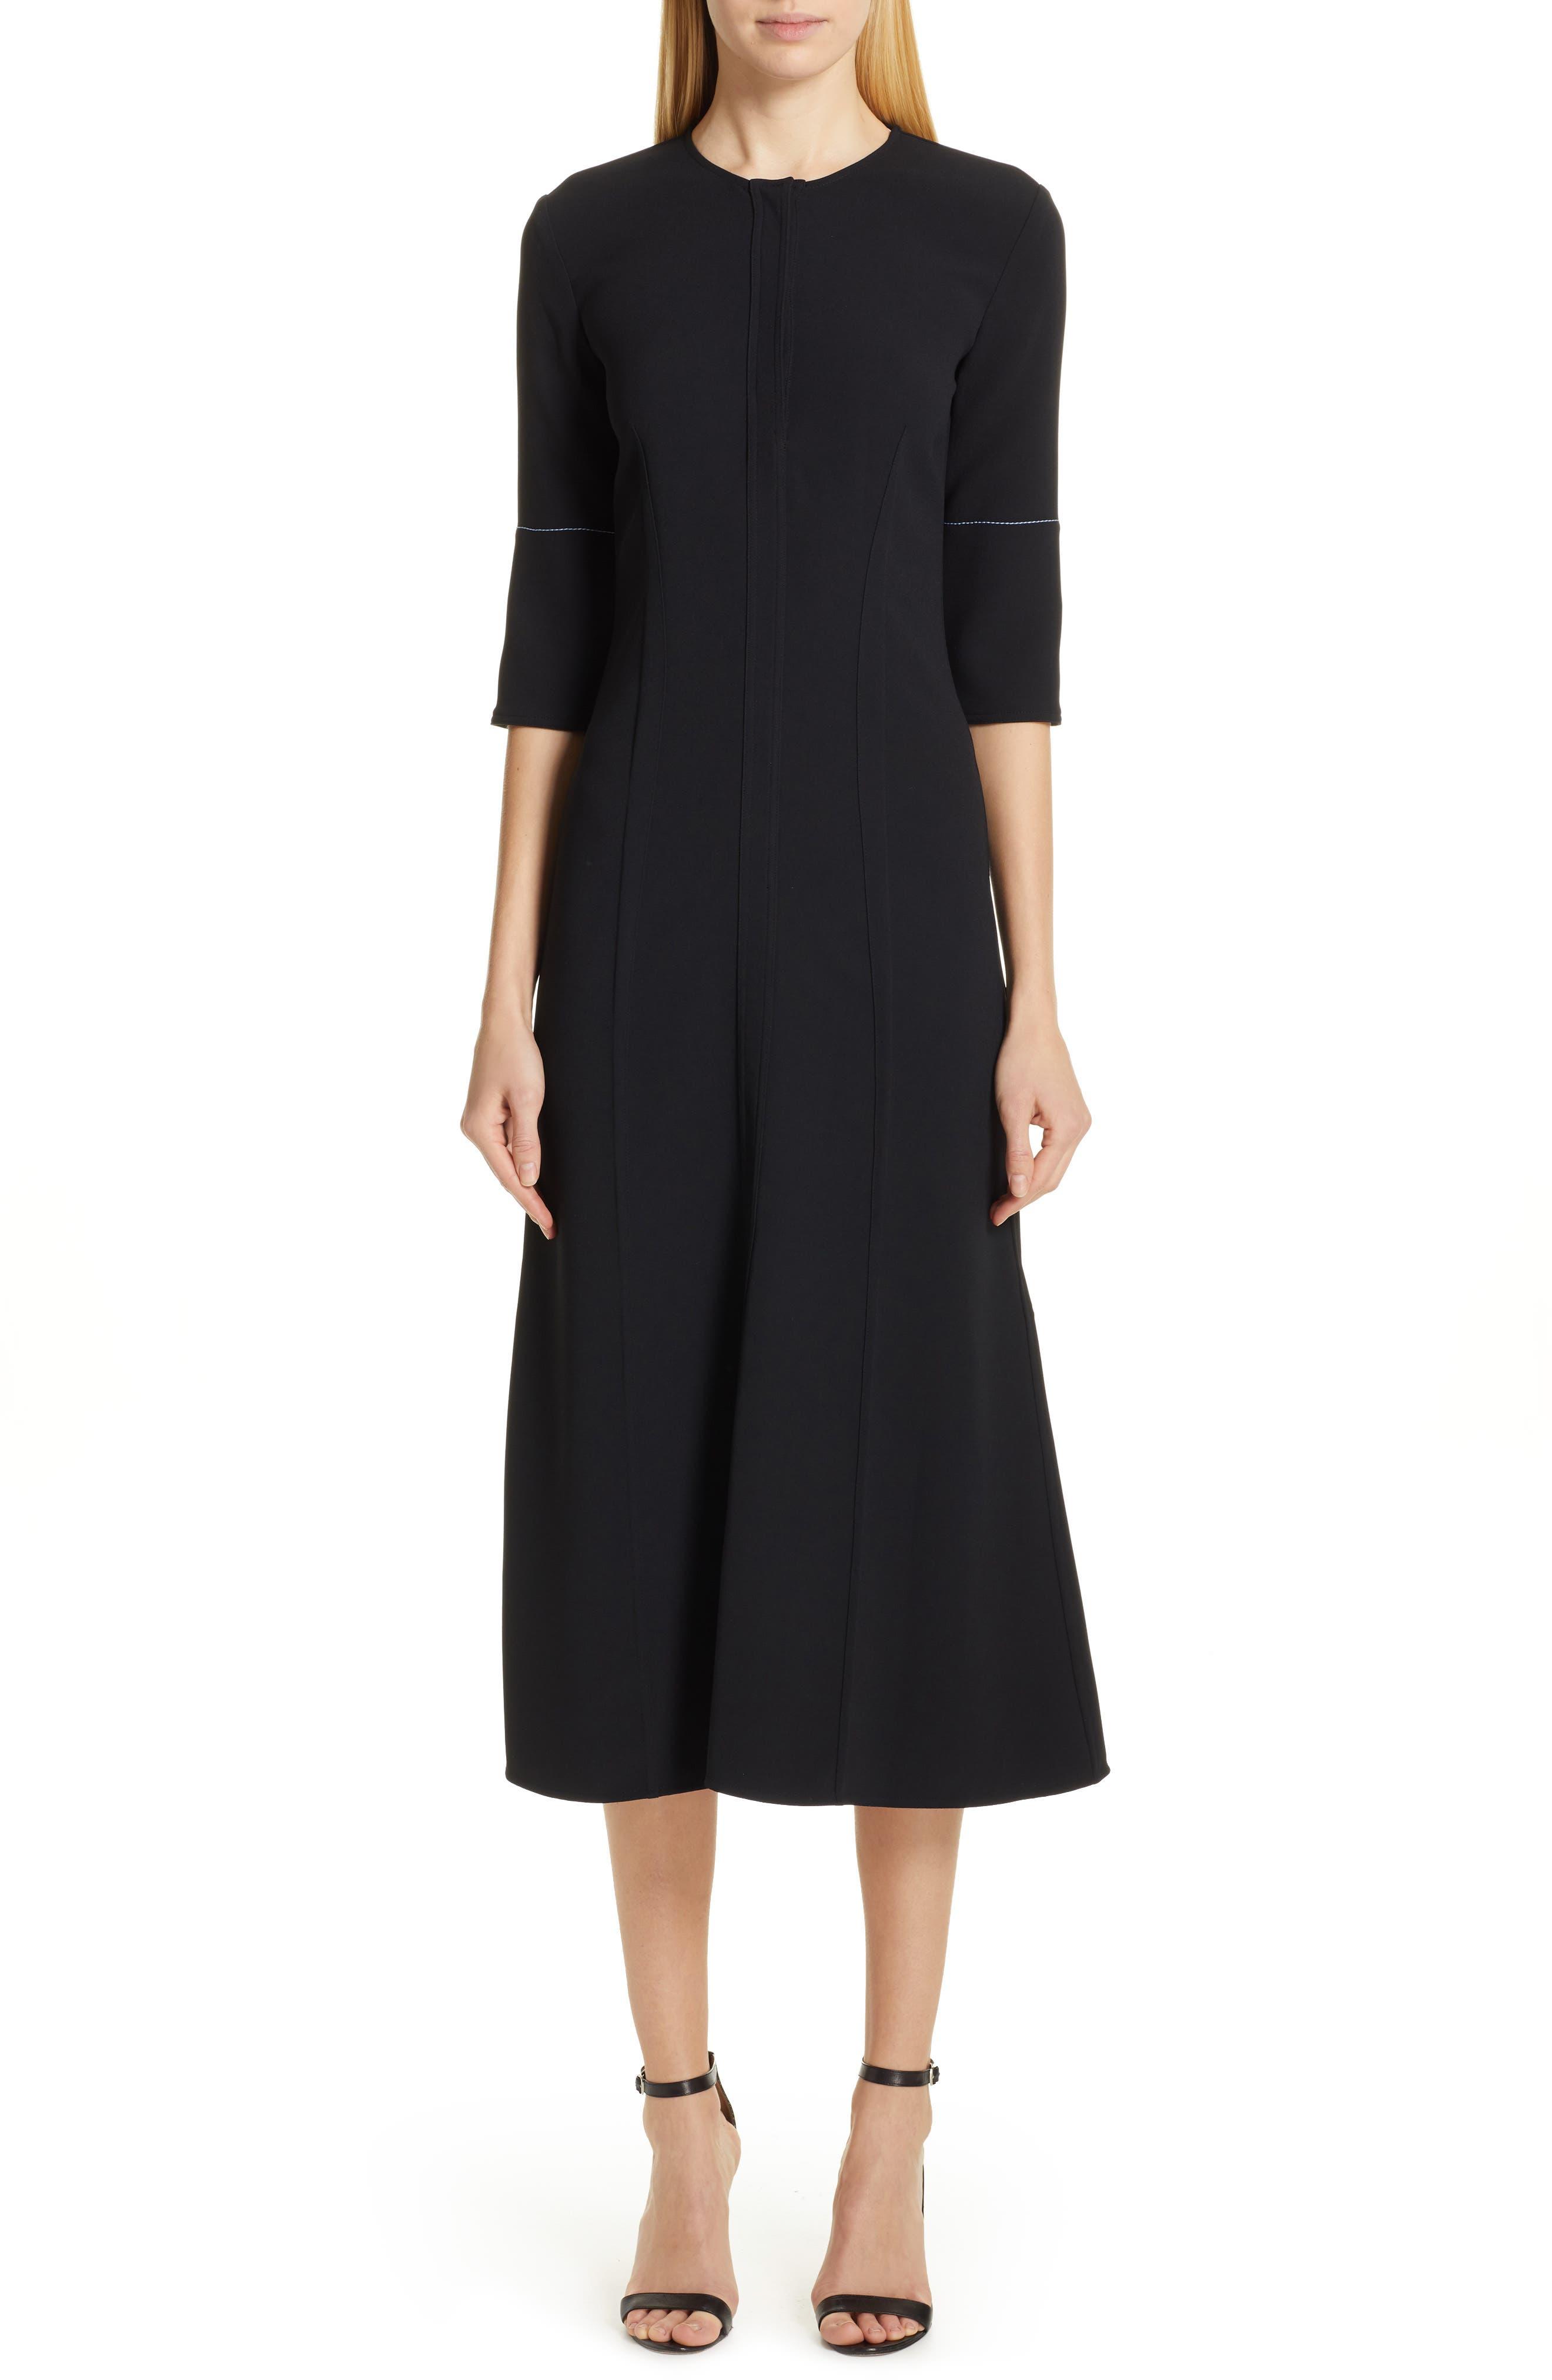 VICTORIA BECKHAM Contrast Stitch Crepe Dress, Main, color, BLACK